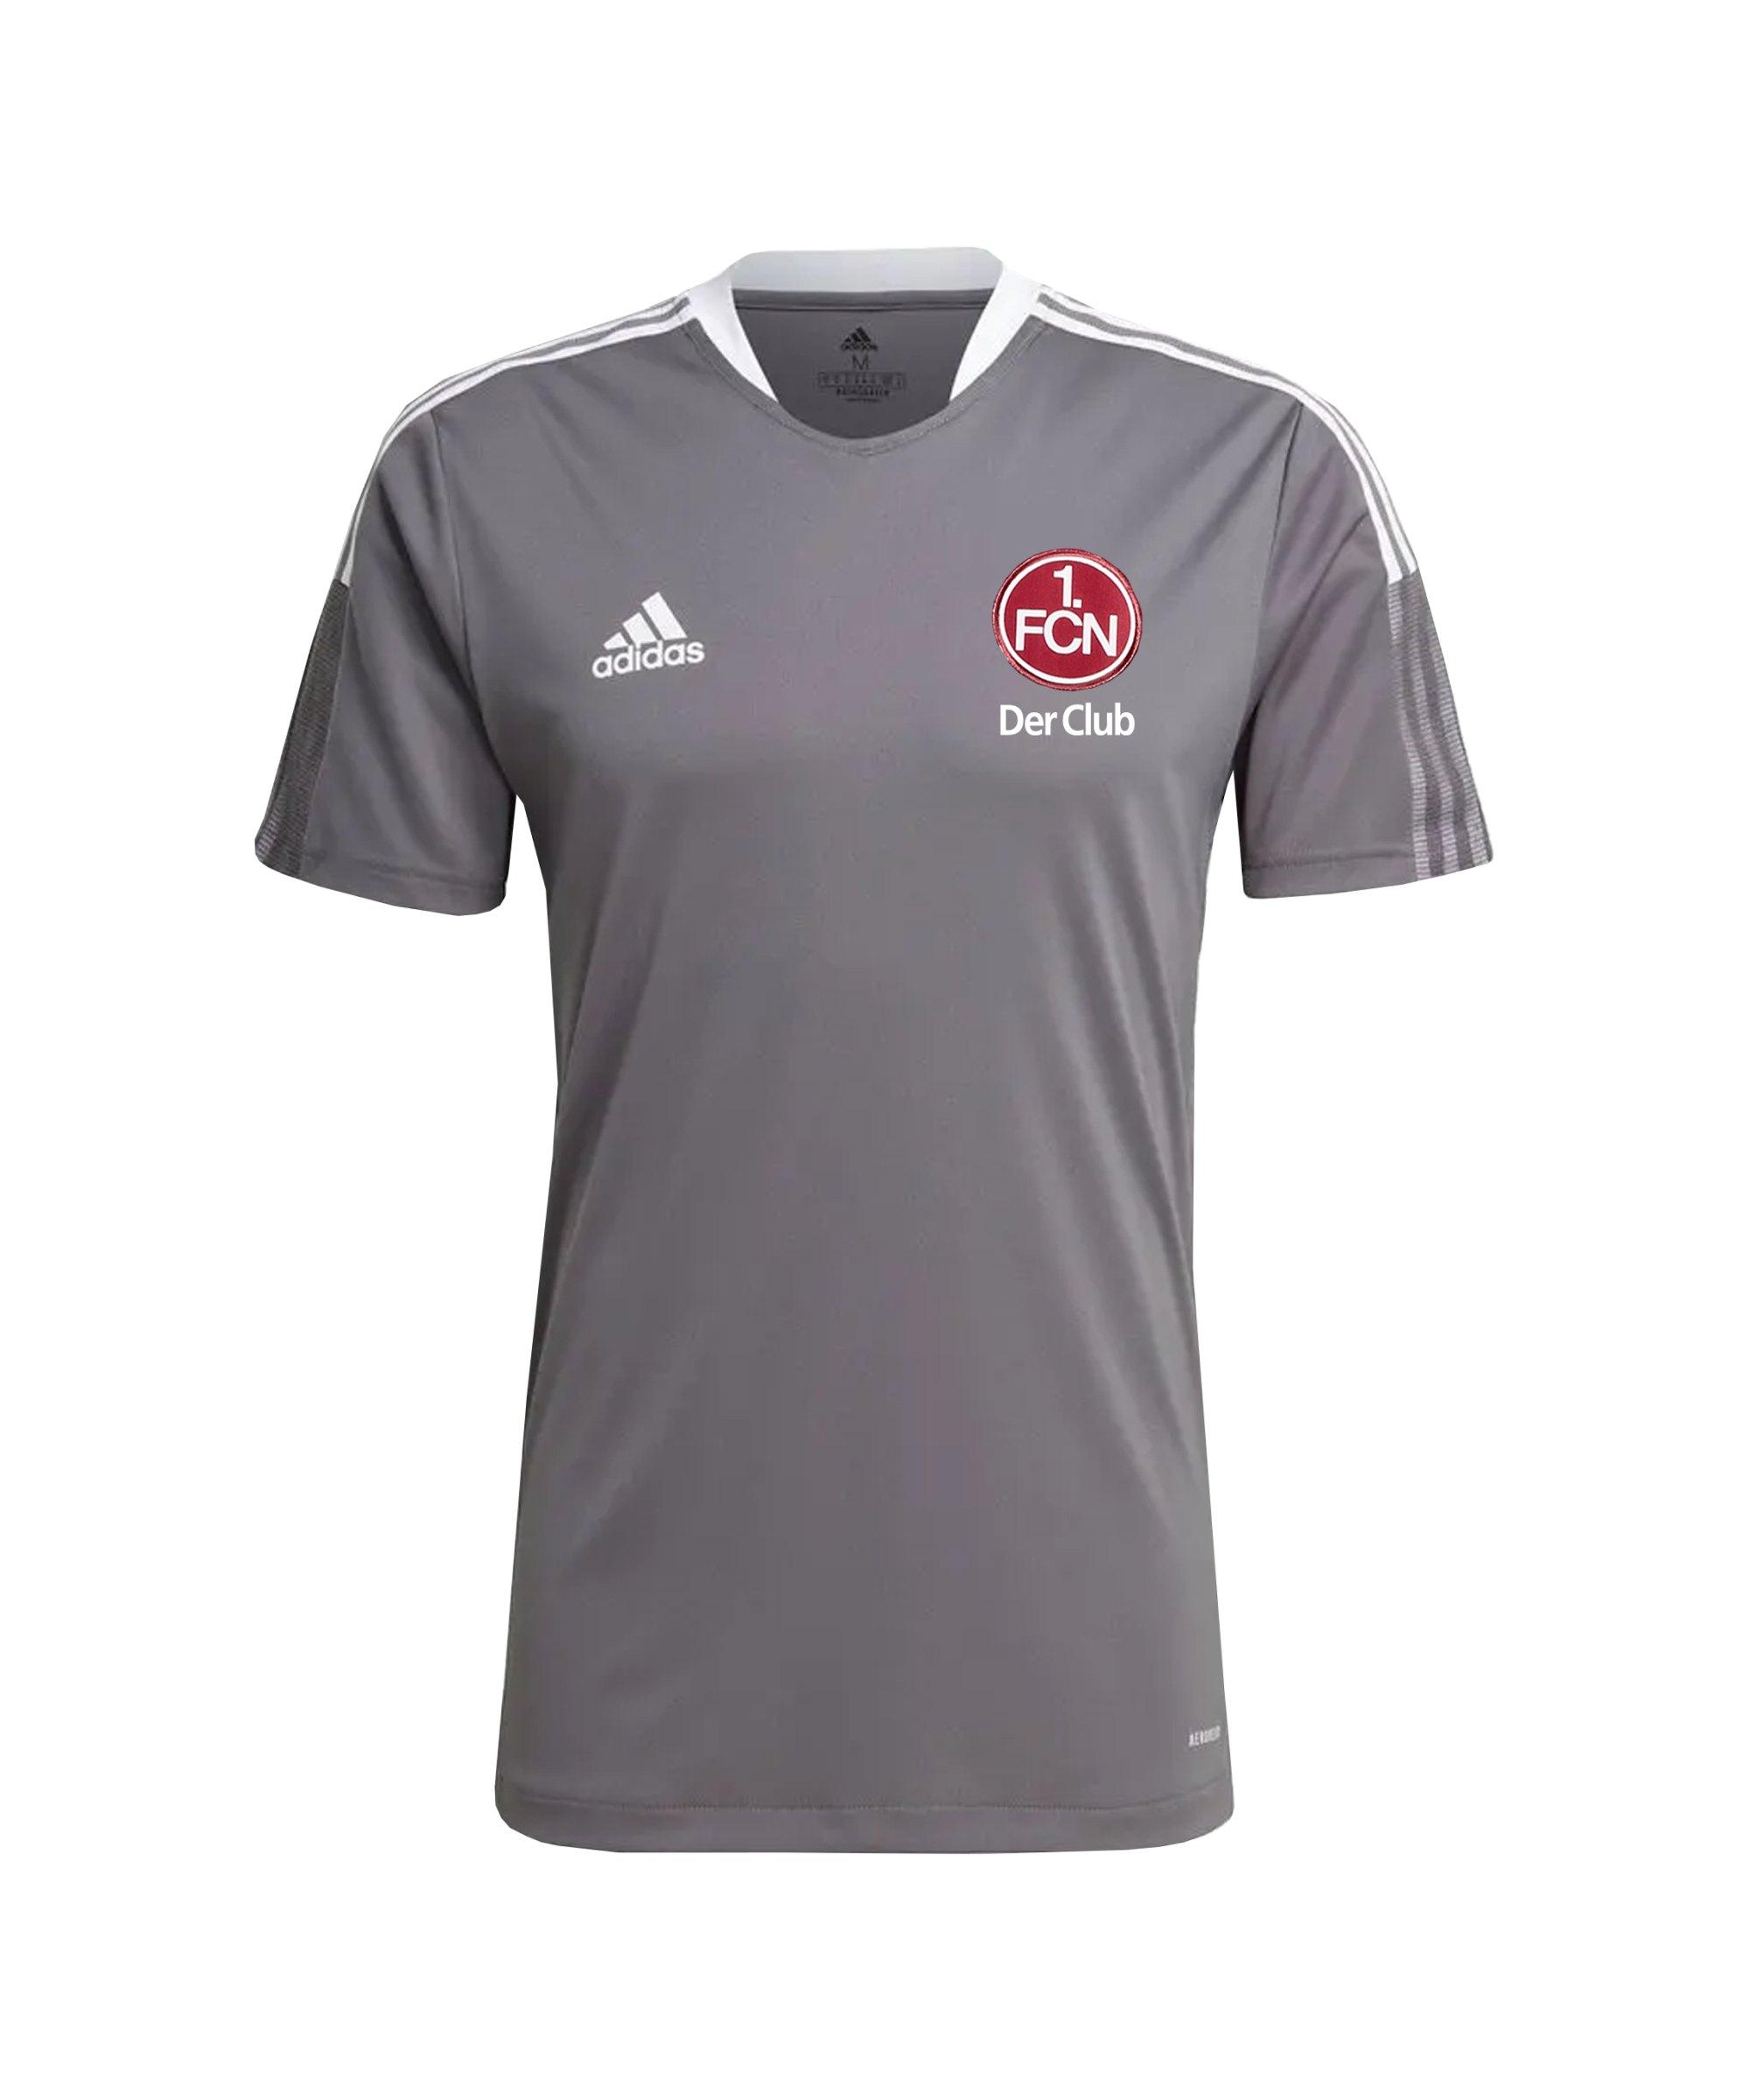 adidas 1. FC Nürnberg Trainingsshirt Grau - grau